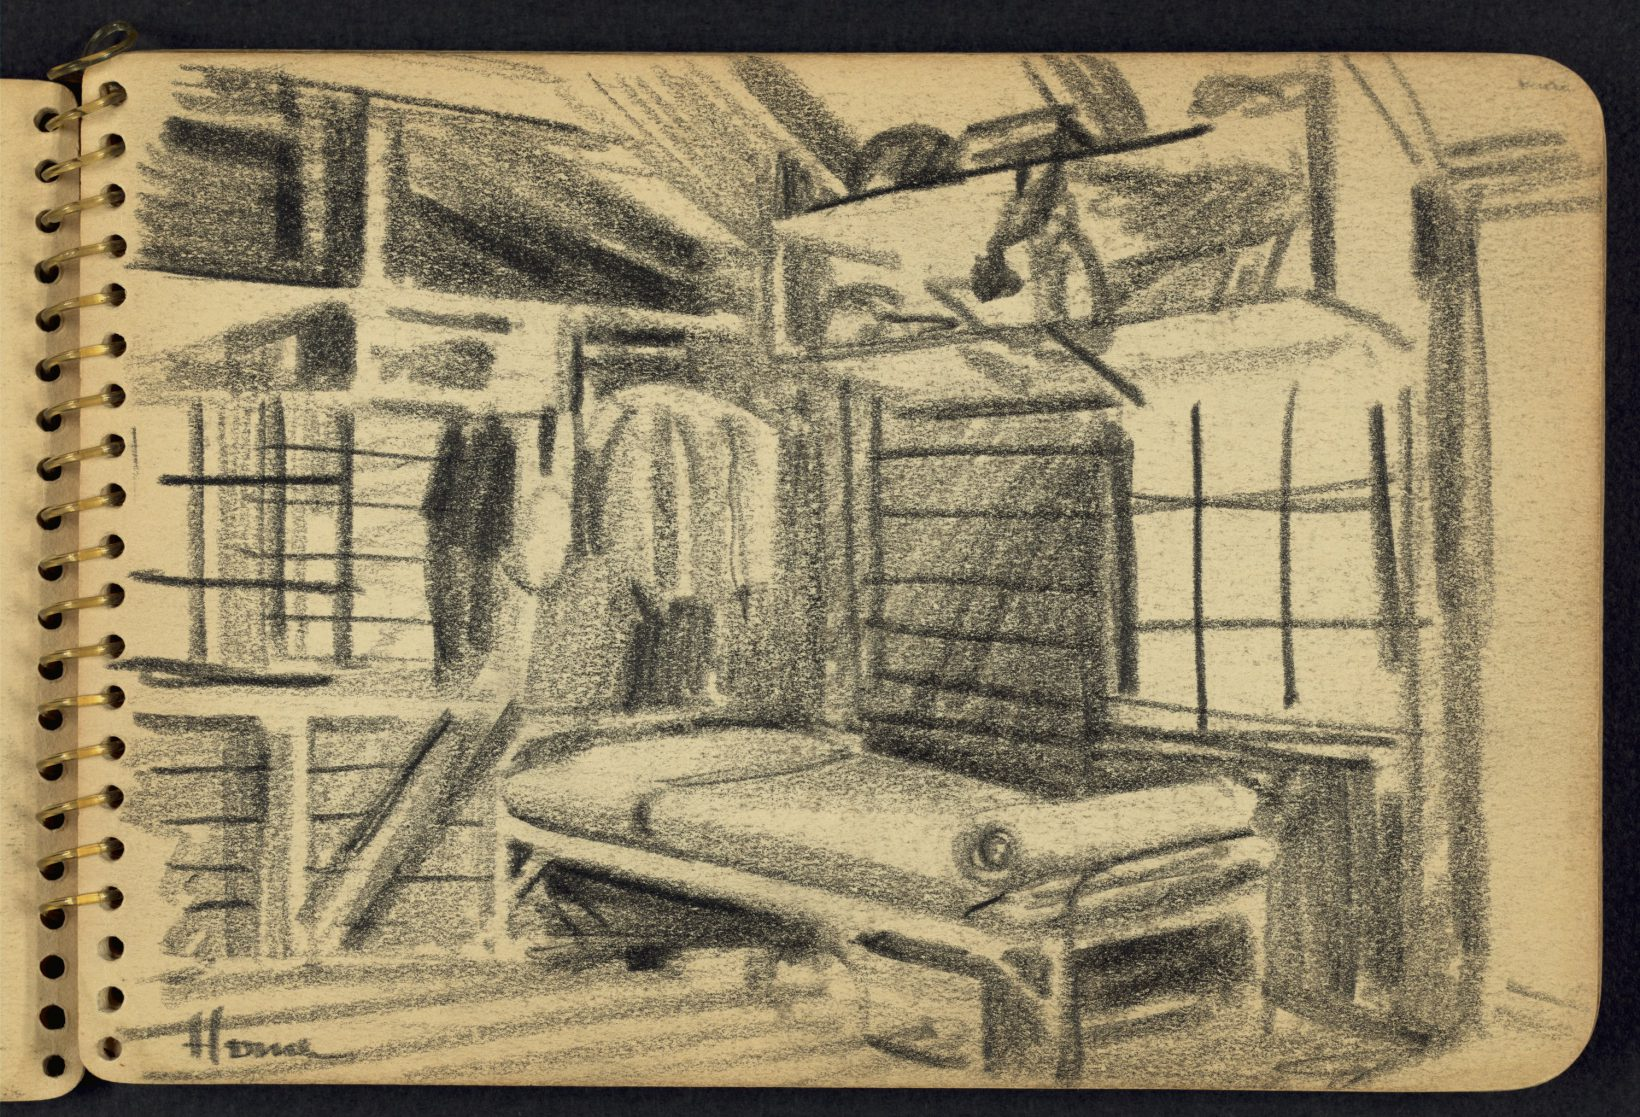 victor-lundy-carnet-croquis-seconde-guerre-mondiale-03